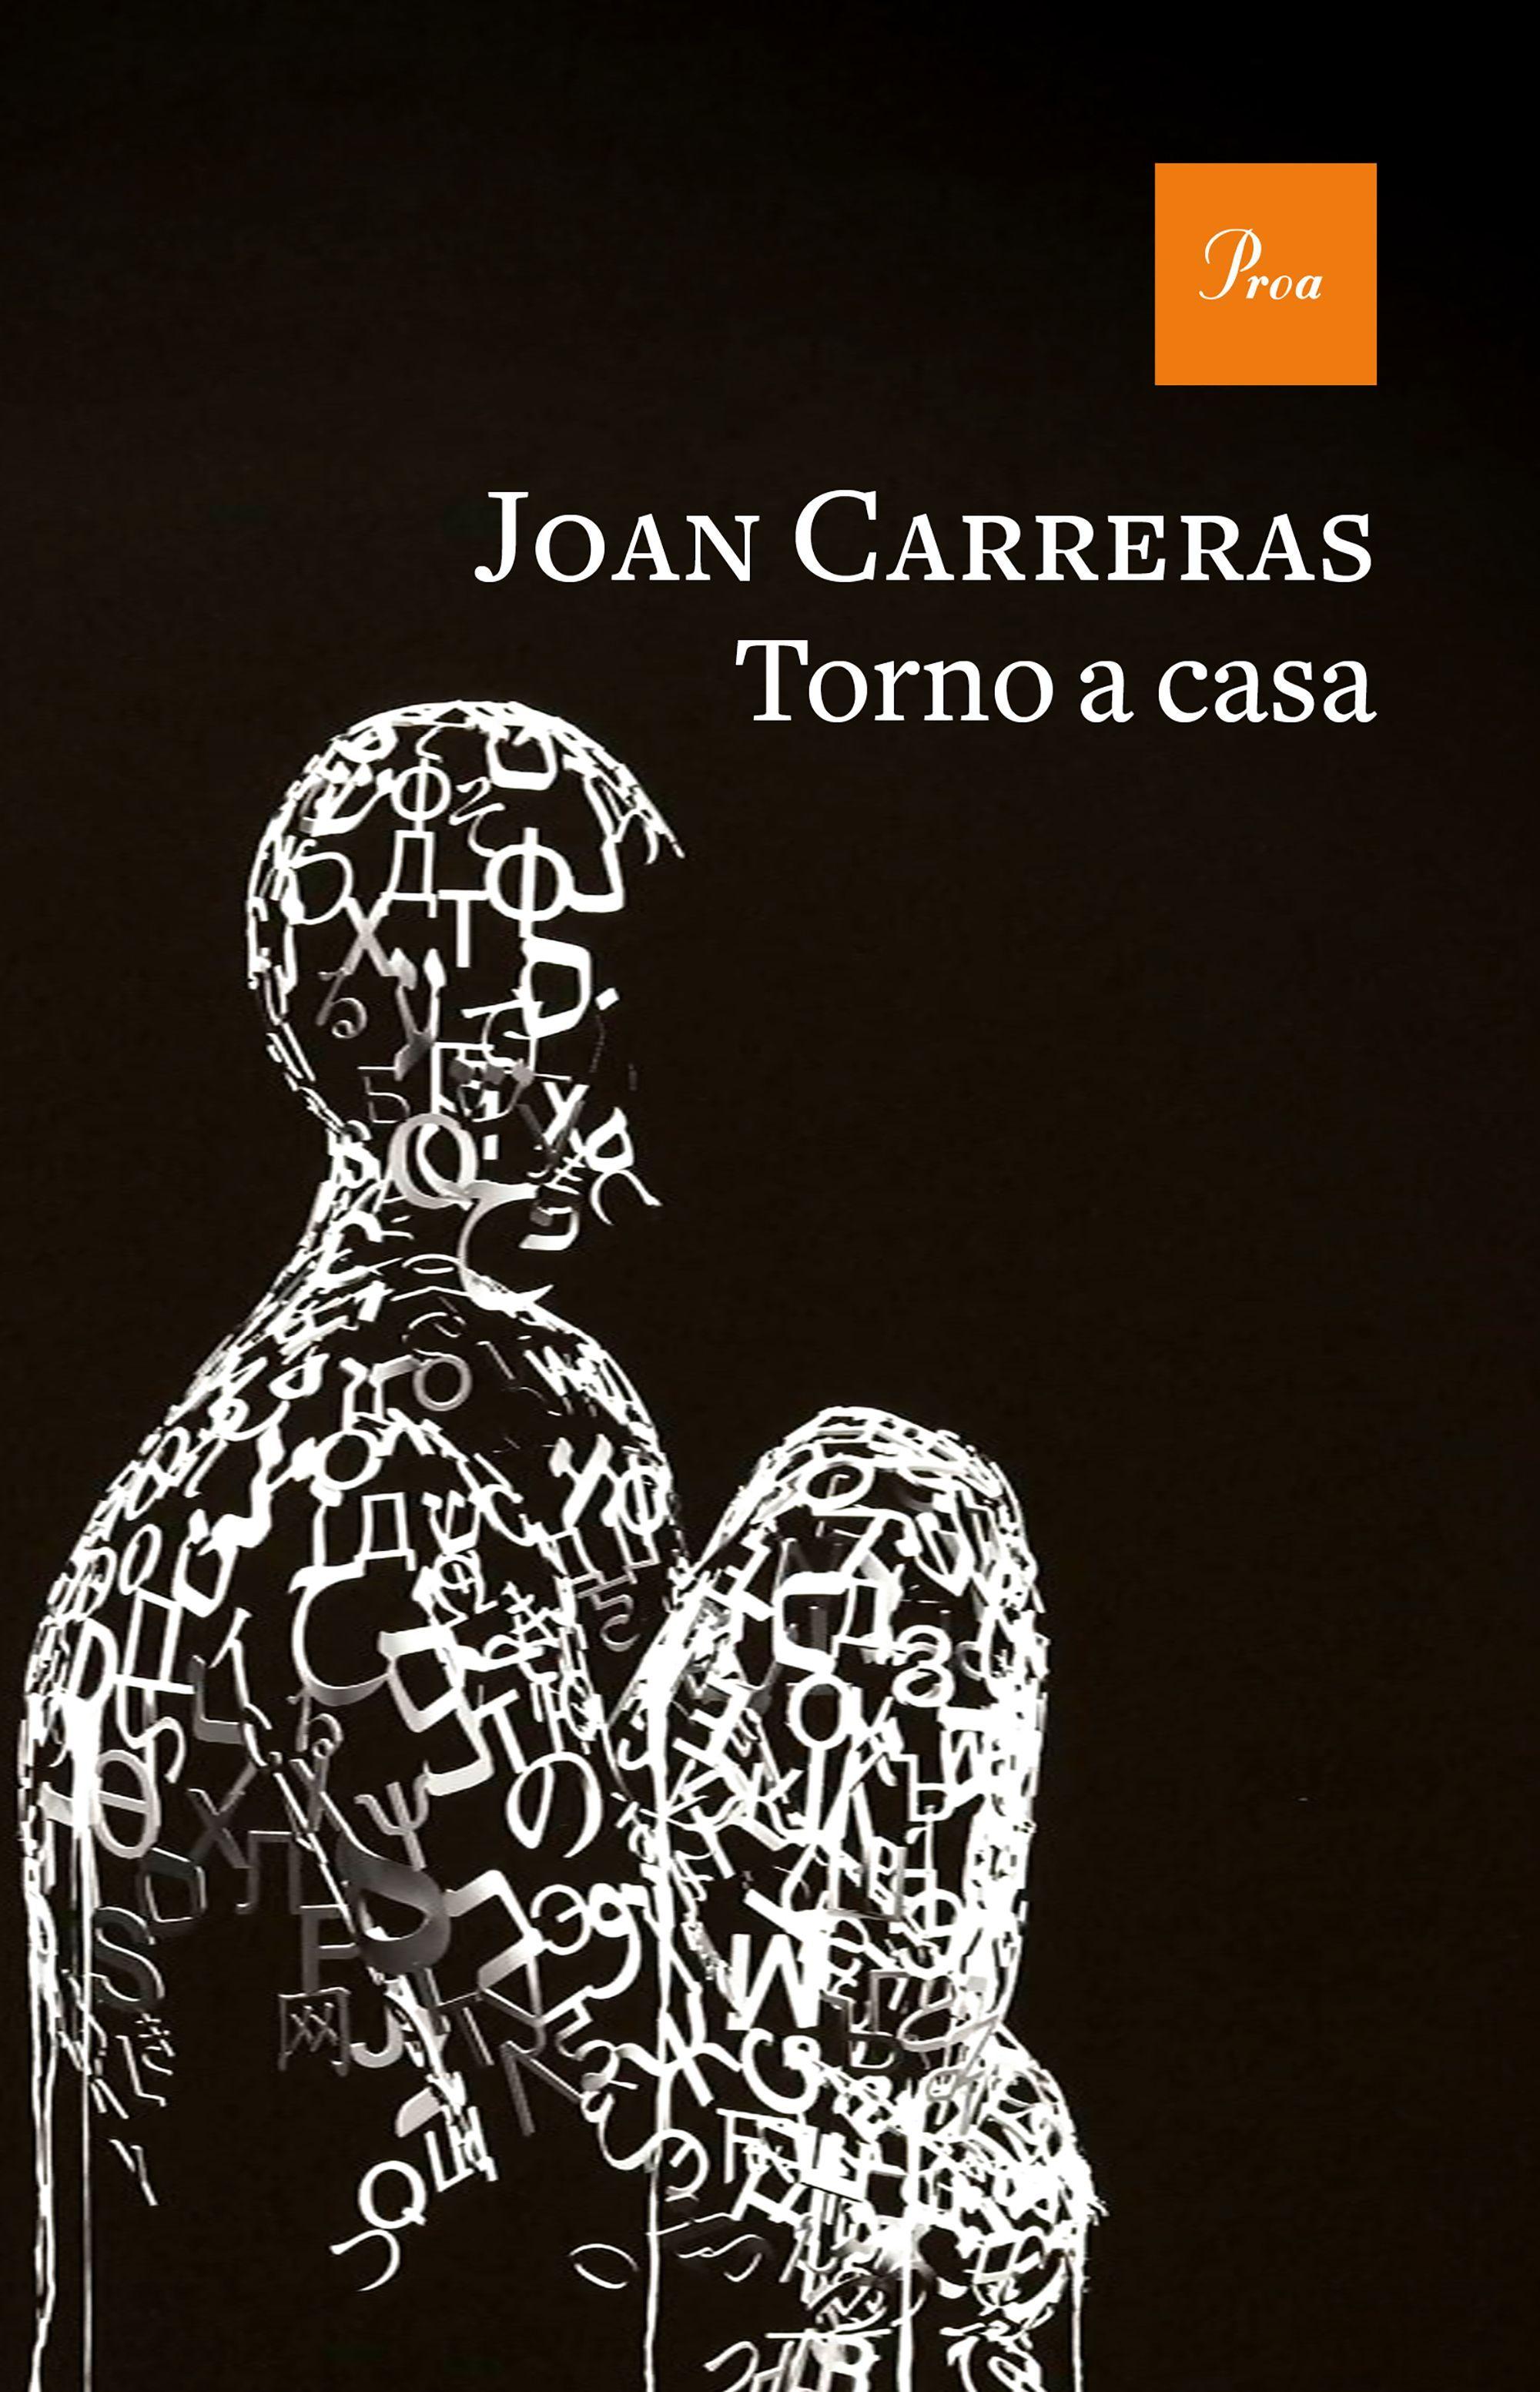 TORNO A CASA